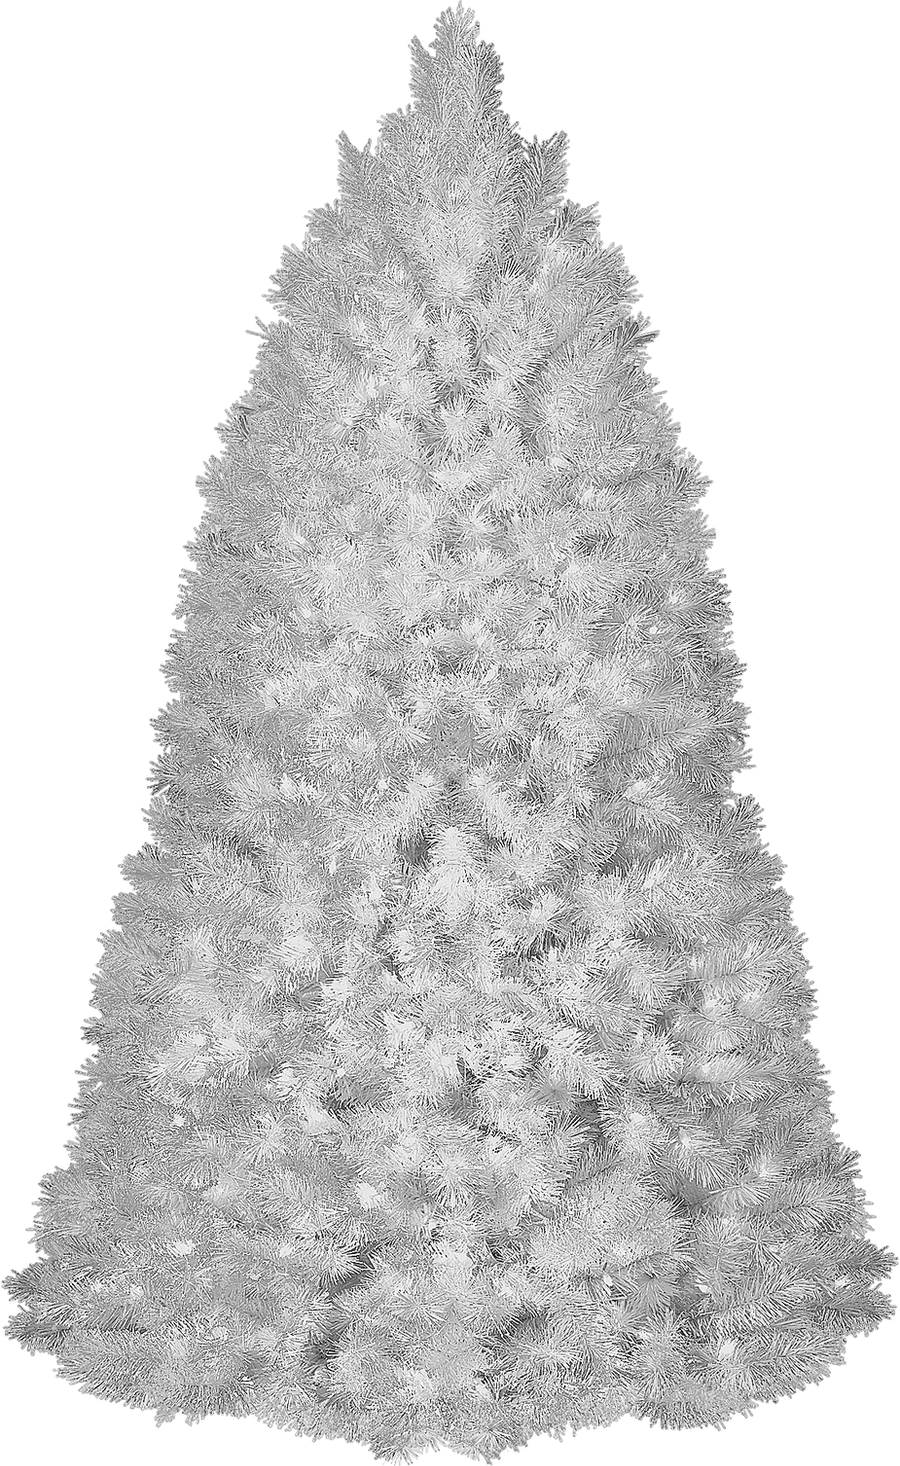 bg christmas tree png by dbszabo1 on DeviantArt